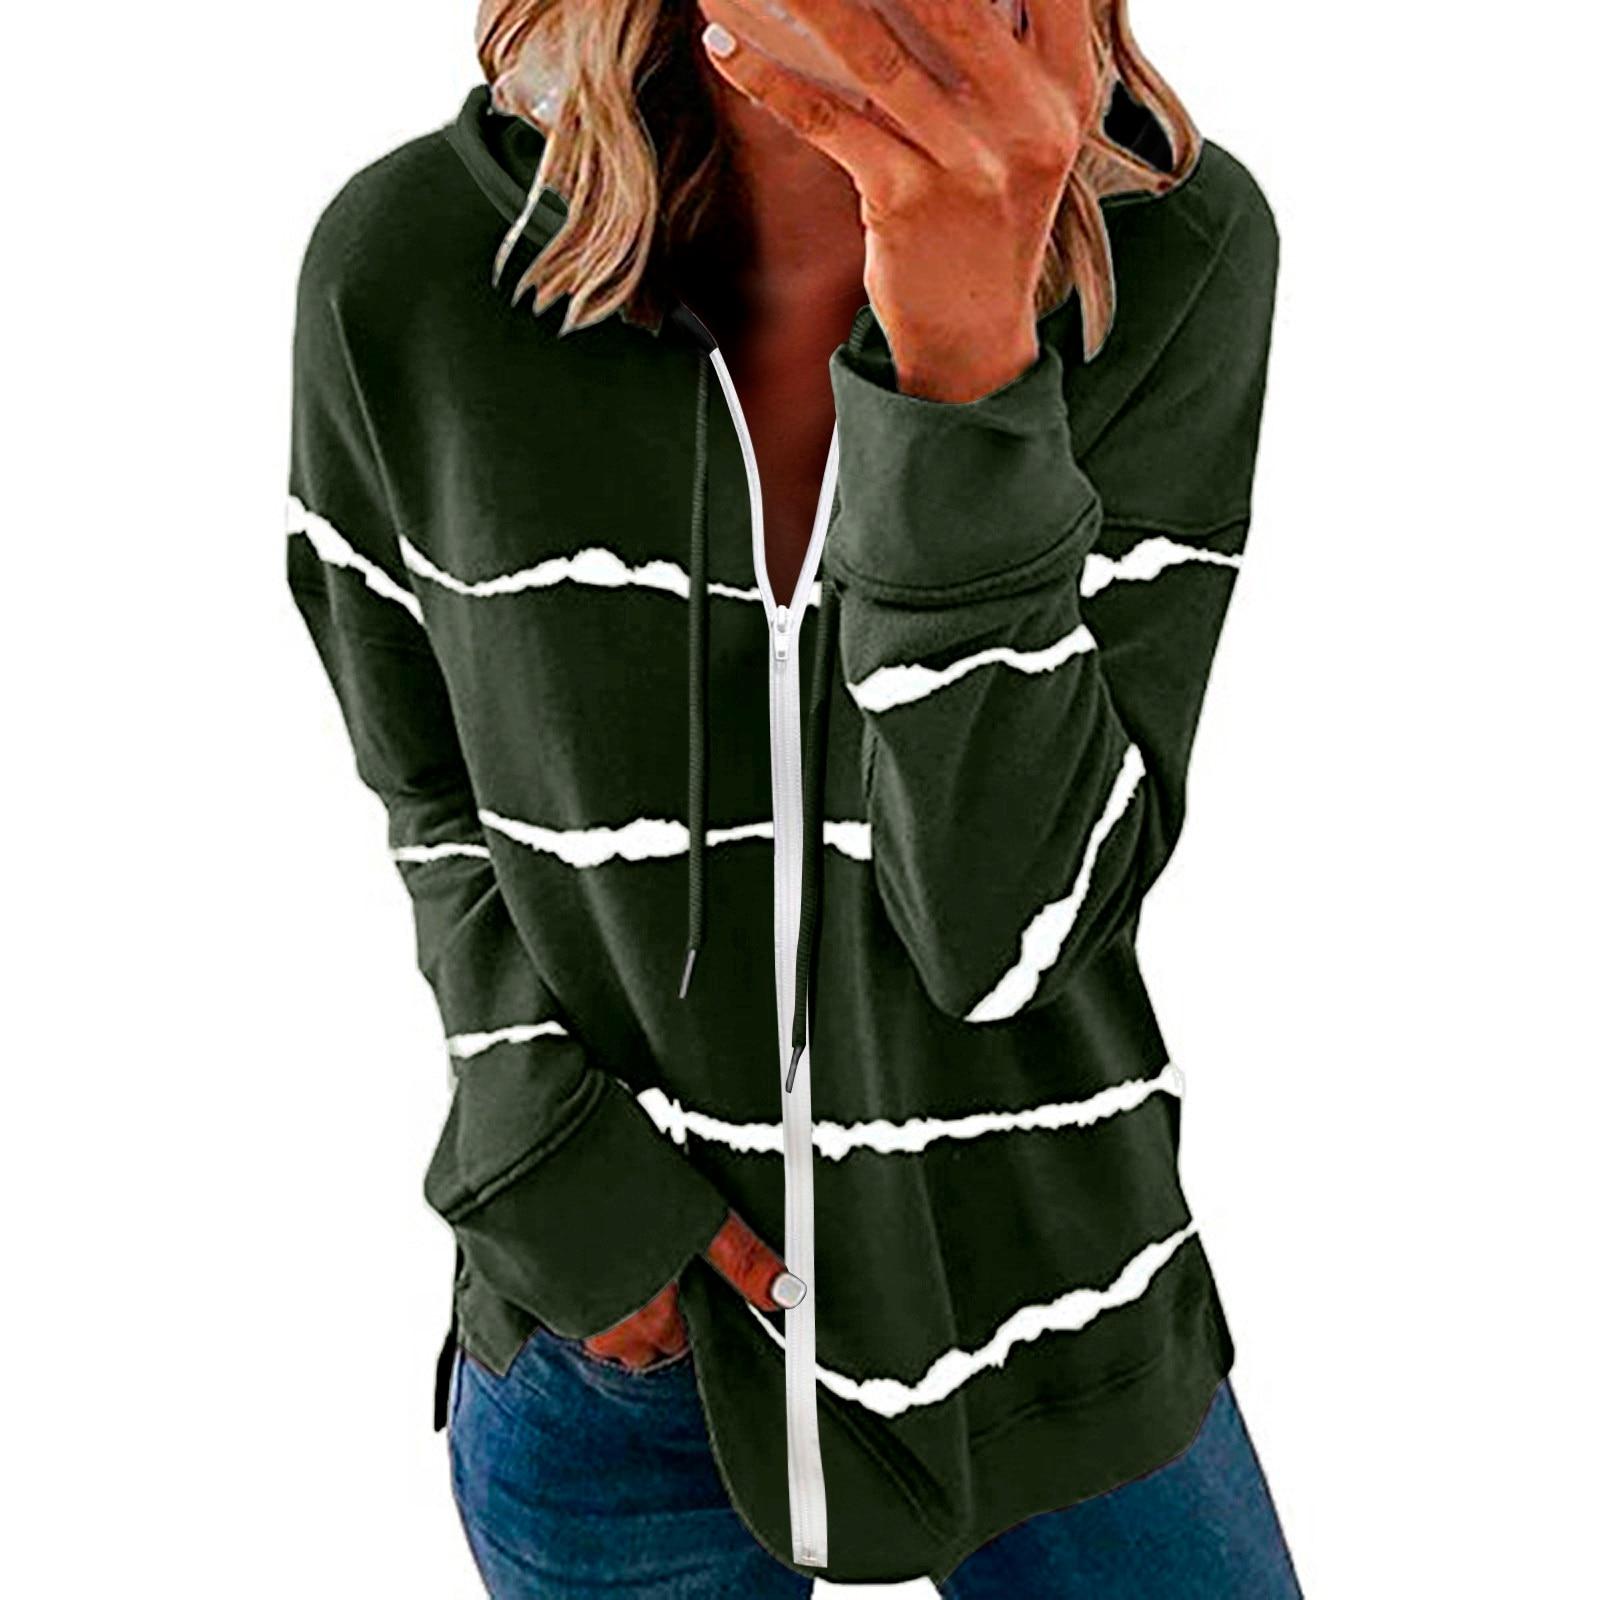 40#Womens Hoodie Striped Full Zipper Long Sleeve Lightweight Sweatshirts Spring Elegant Pullover Tee Tops толстовка женская 13